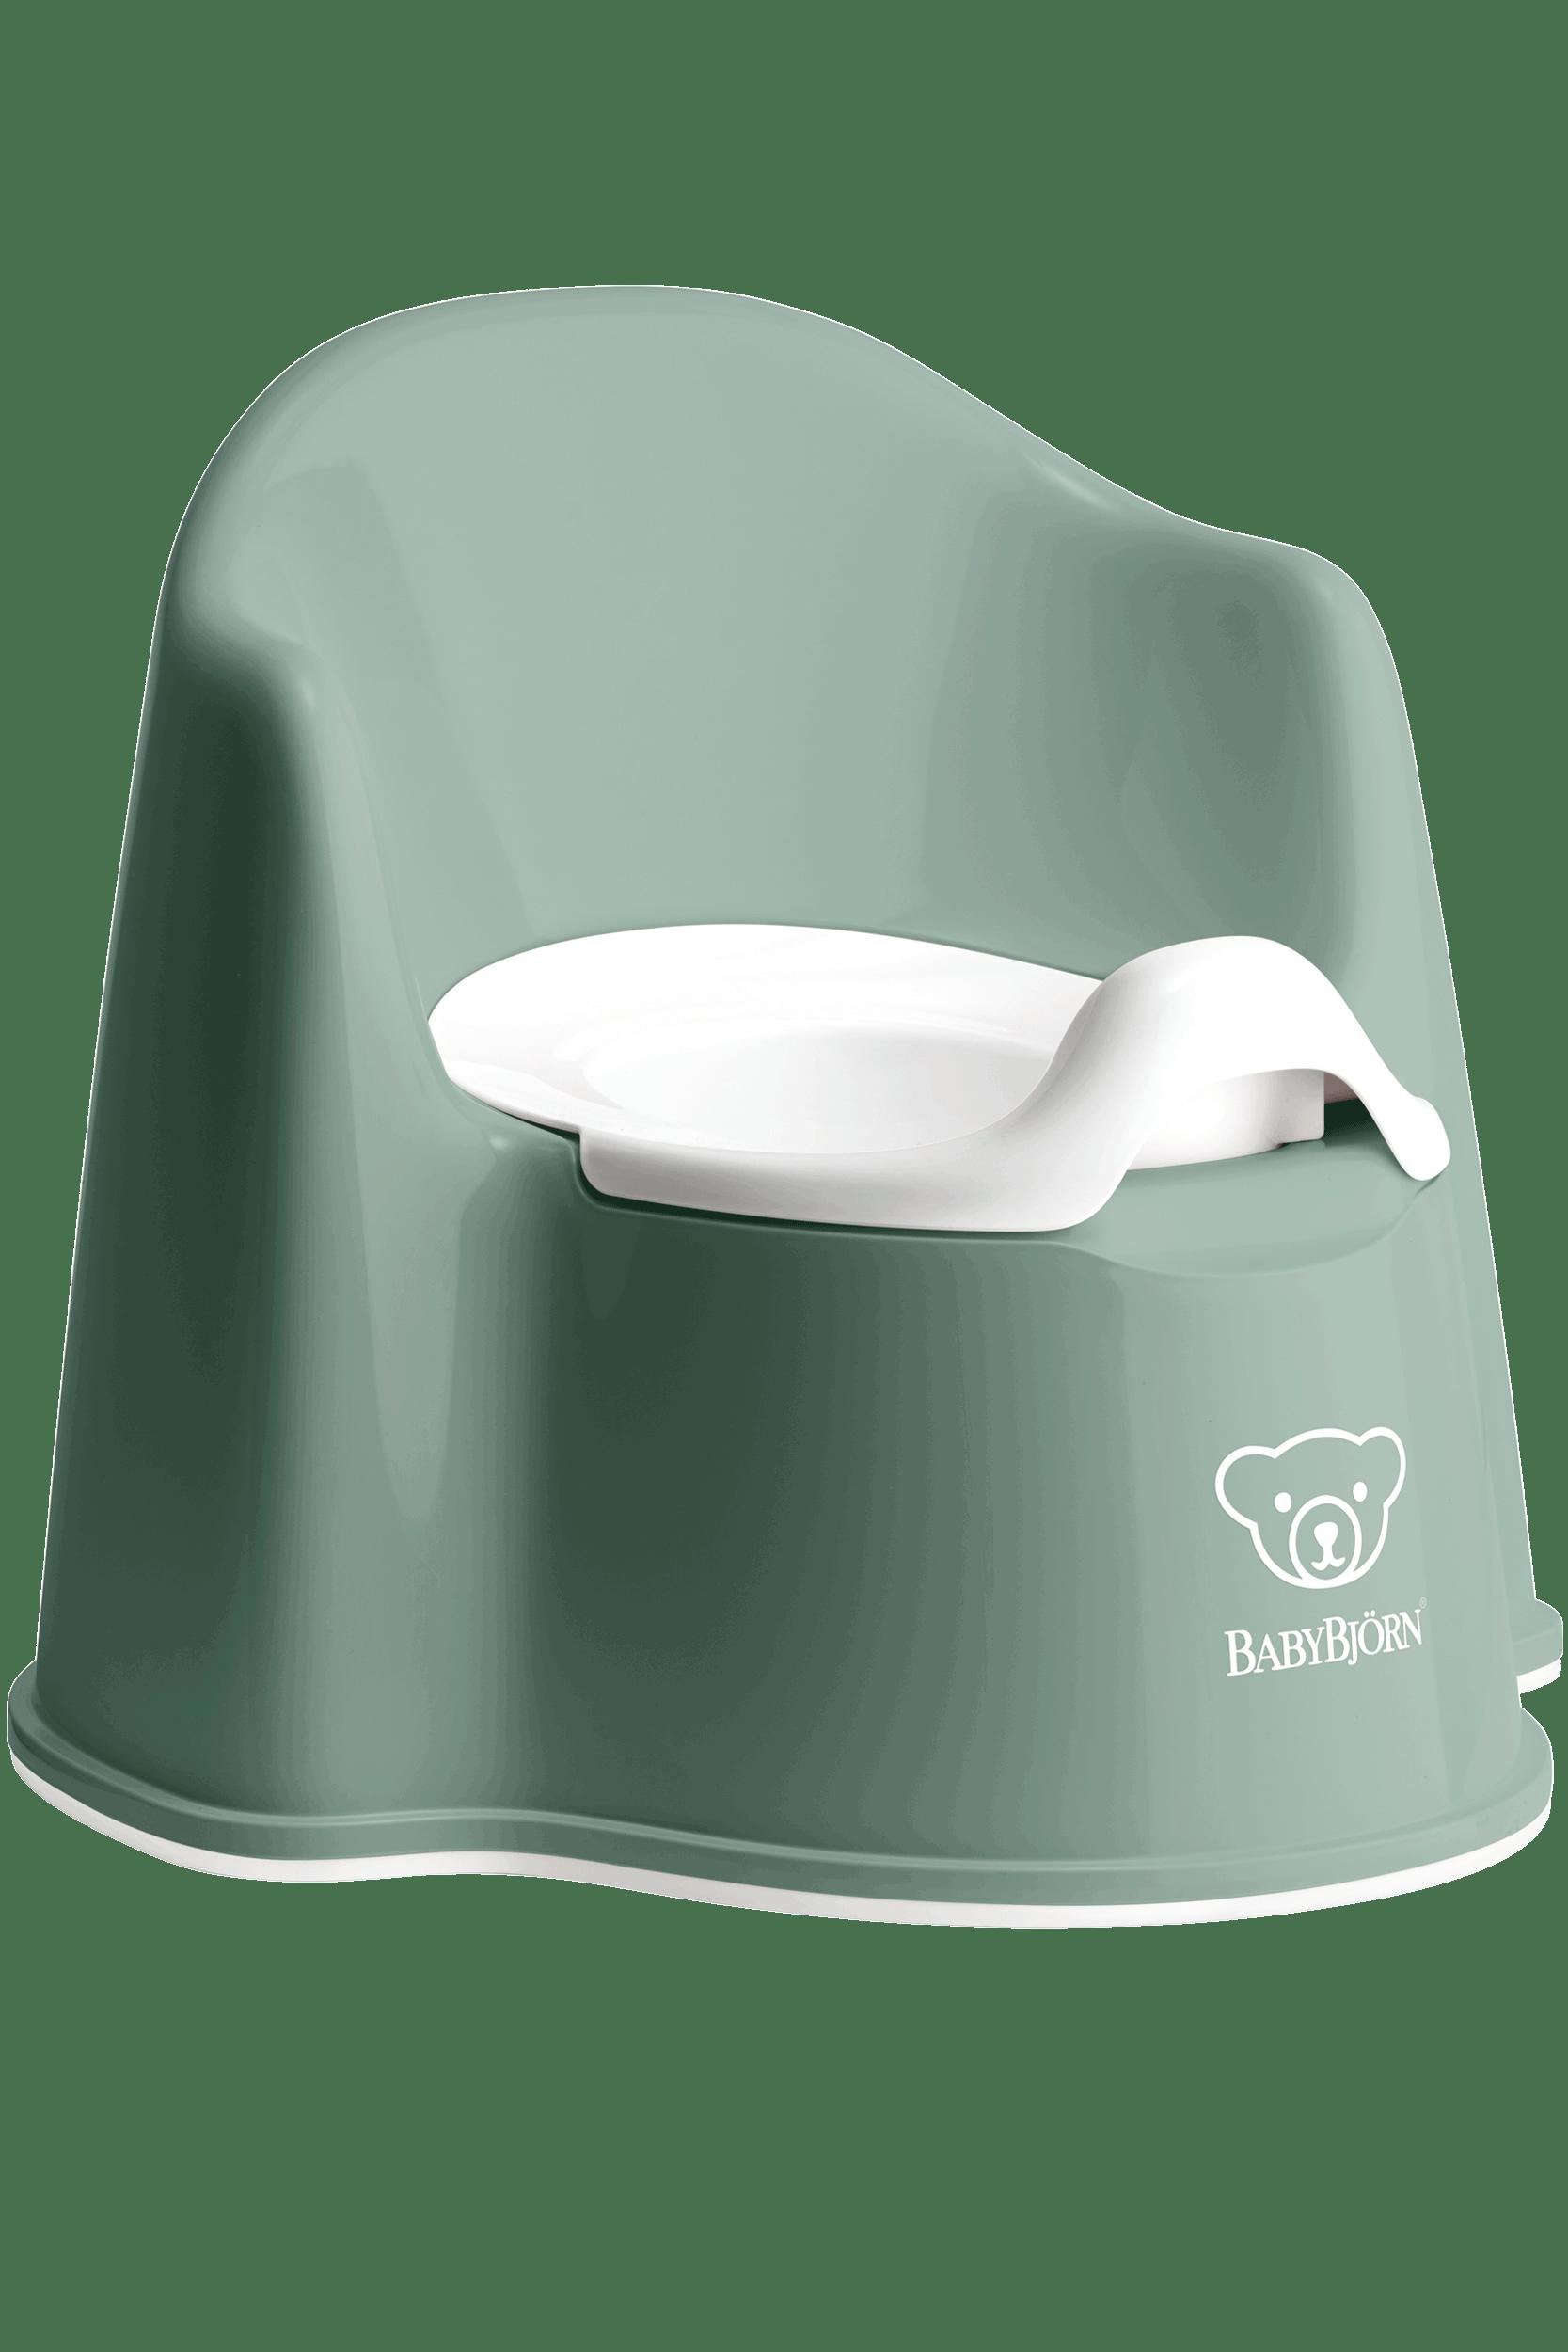 BABYBJÖRN Topfstuhl Graugrün/Weiss